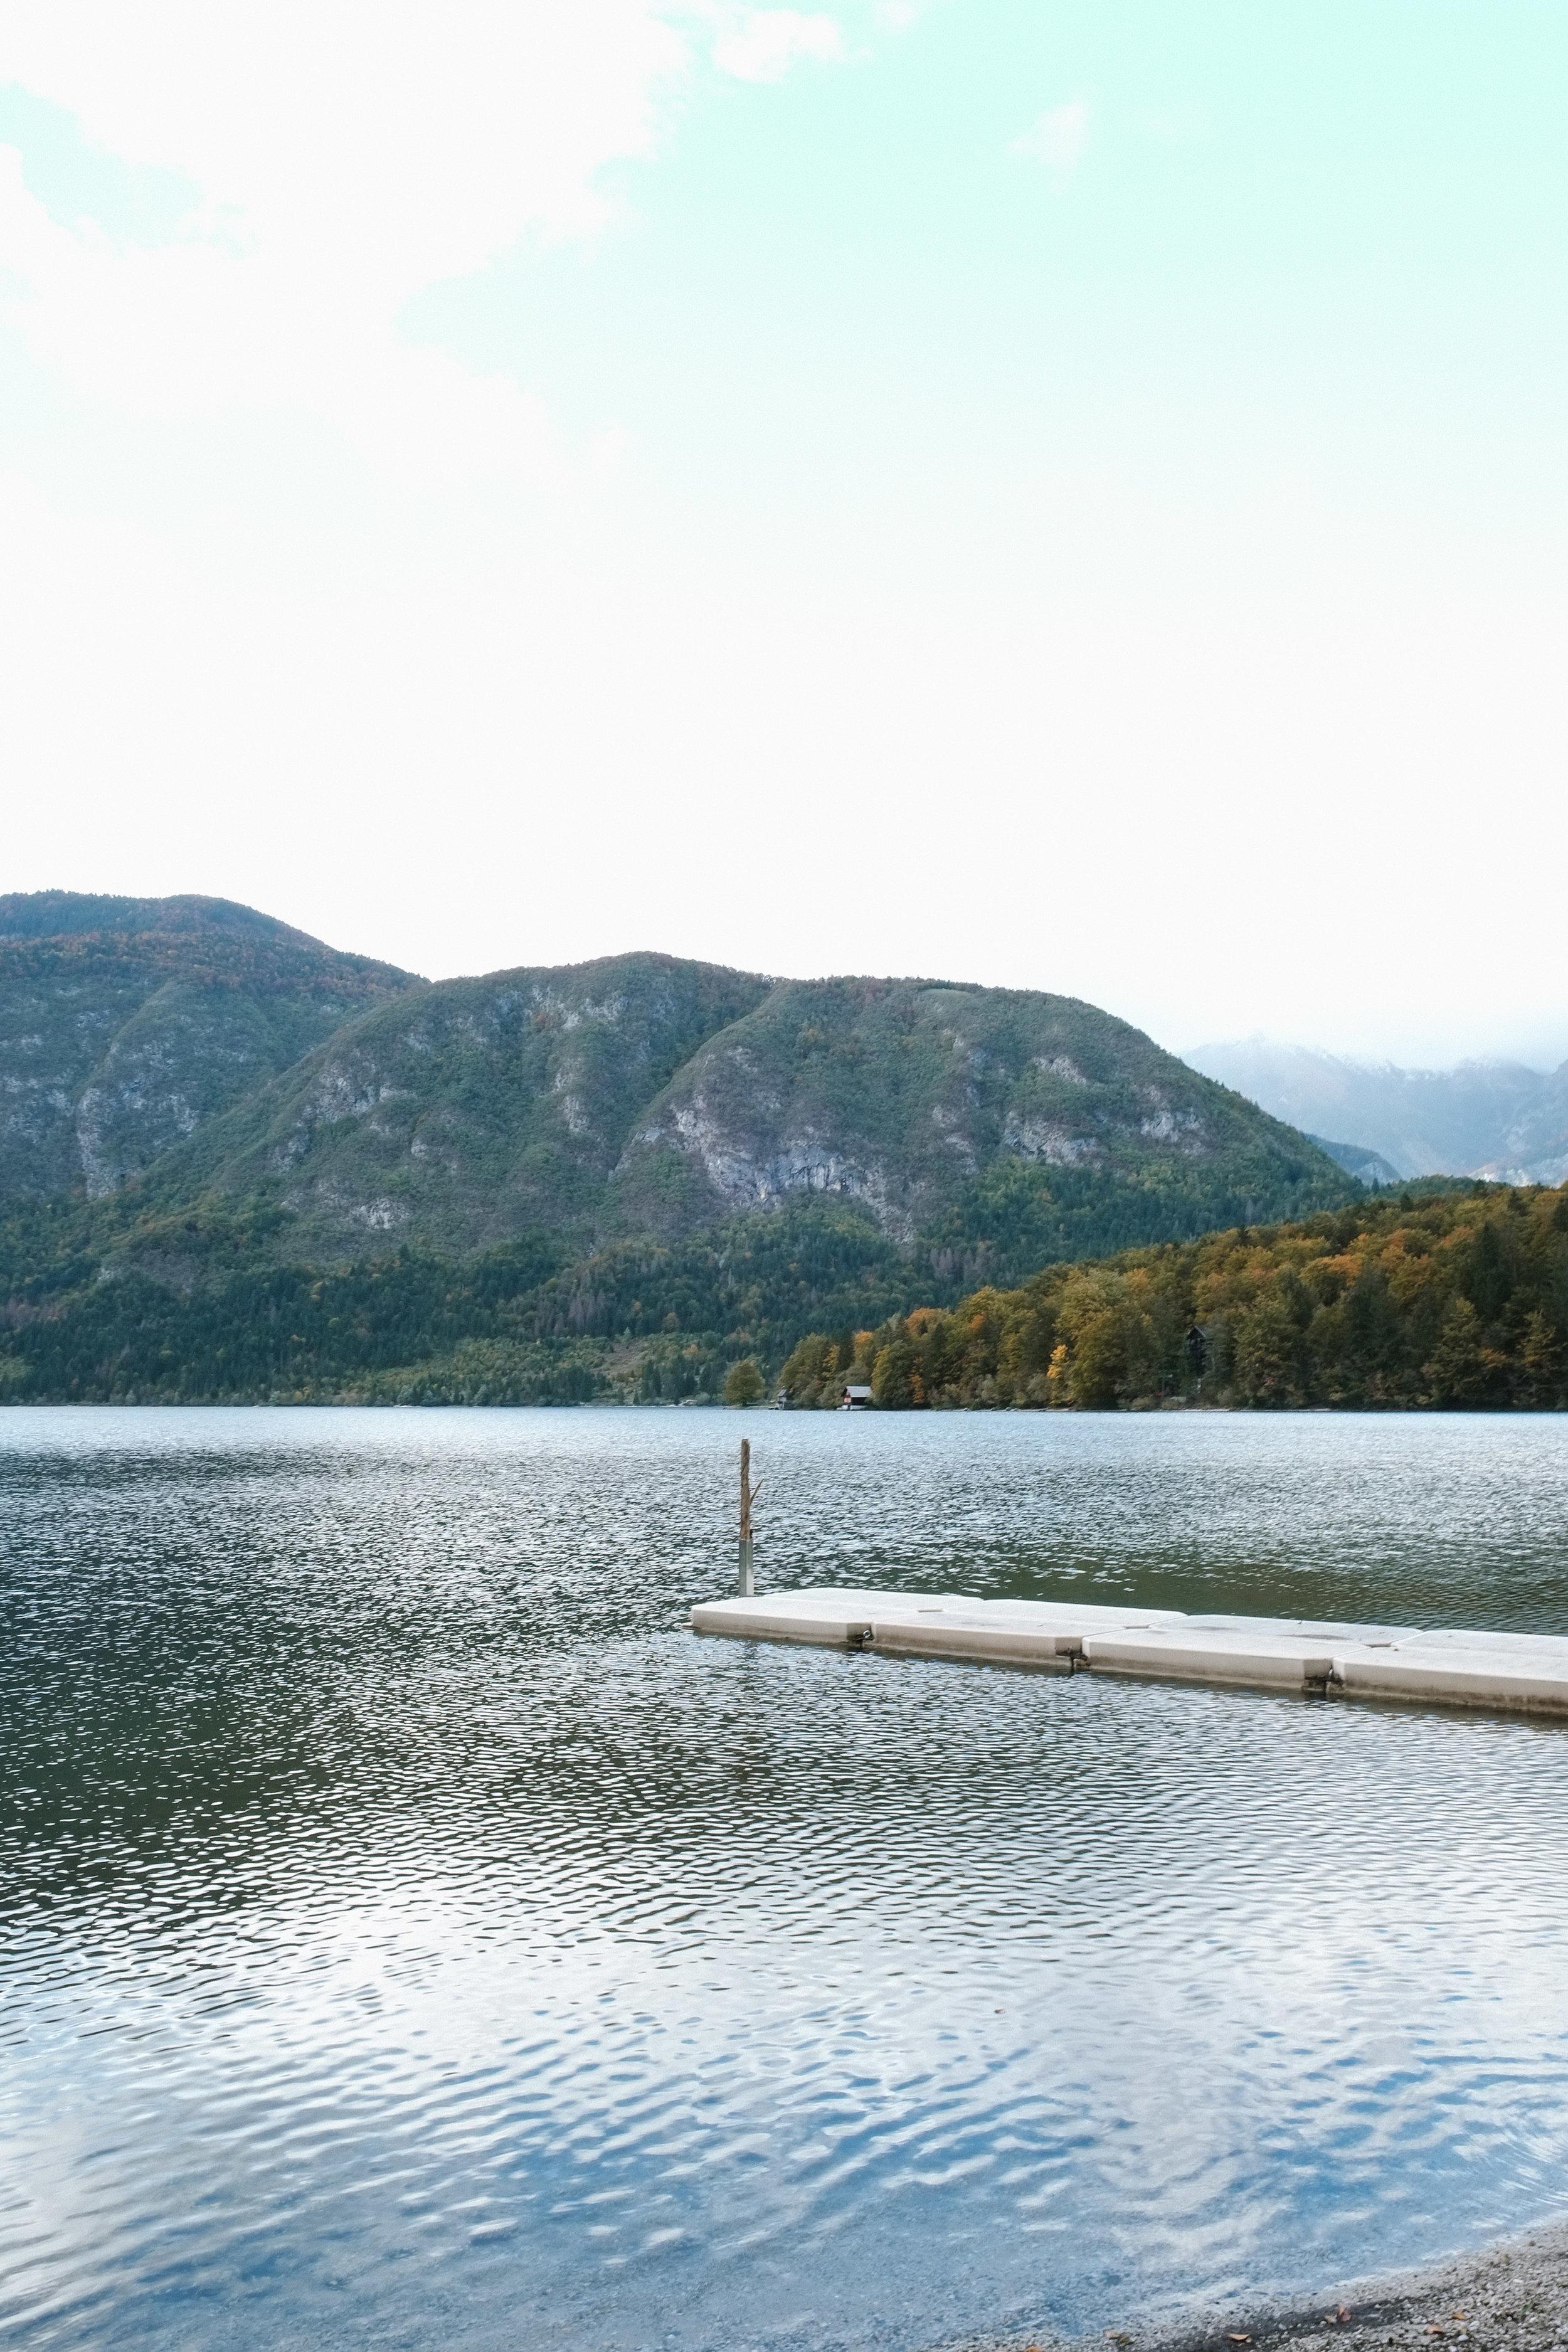 Slovenia_Bled_Lesly Lotha 01.jpg